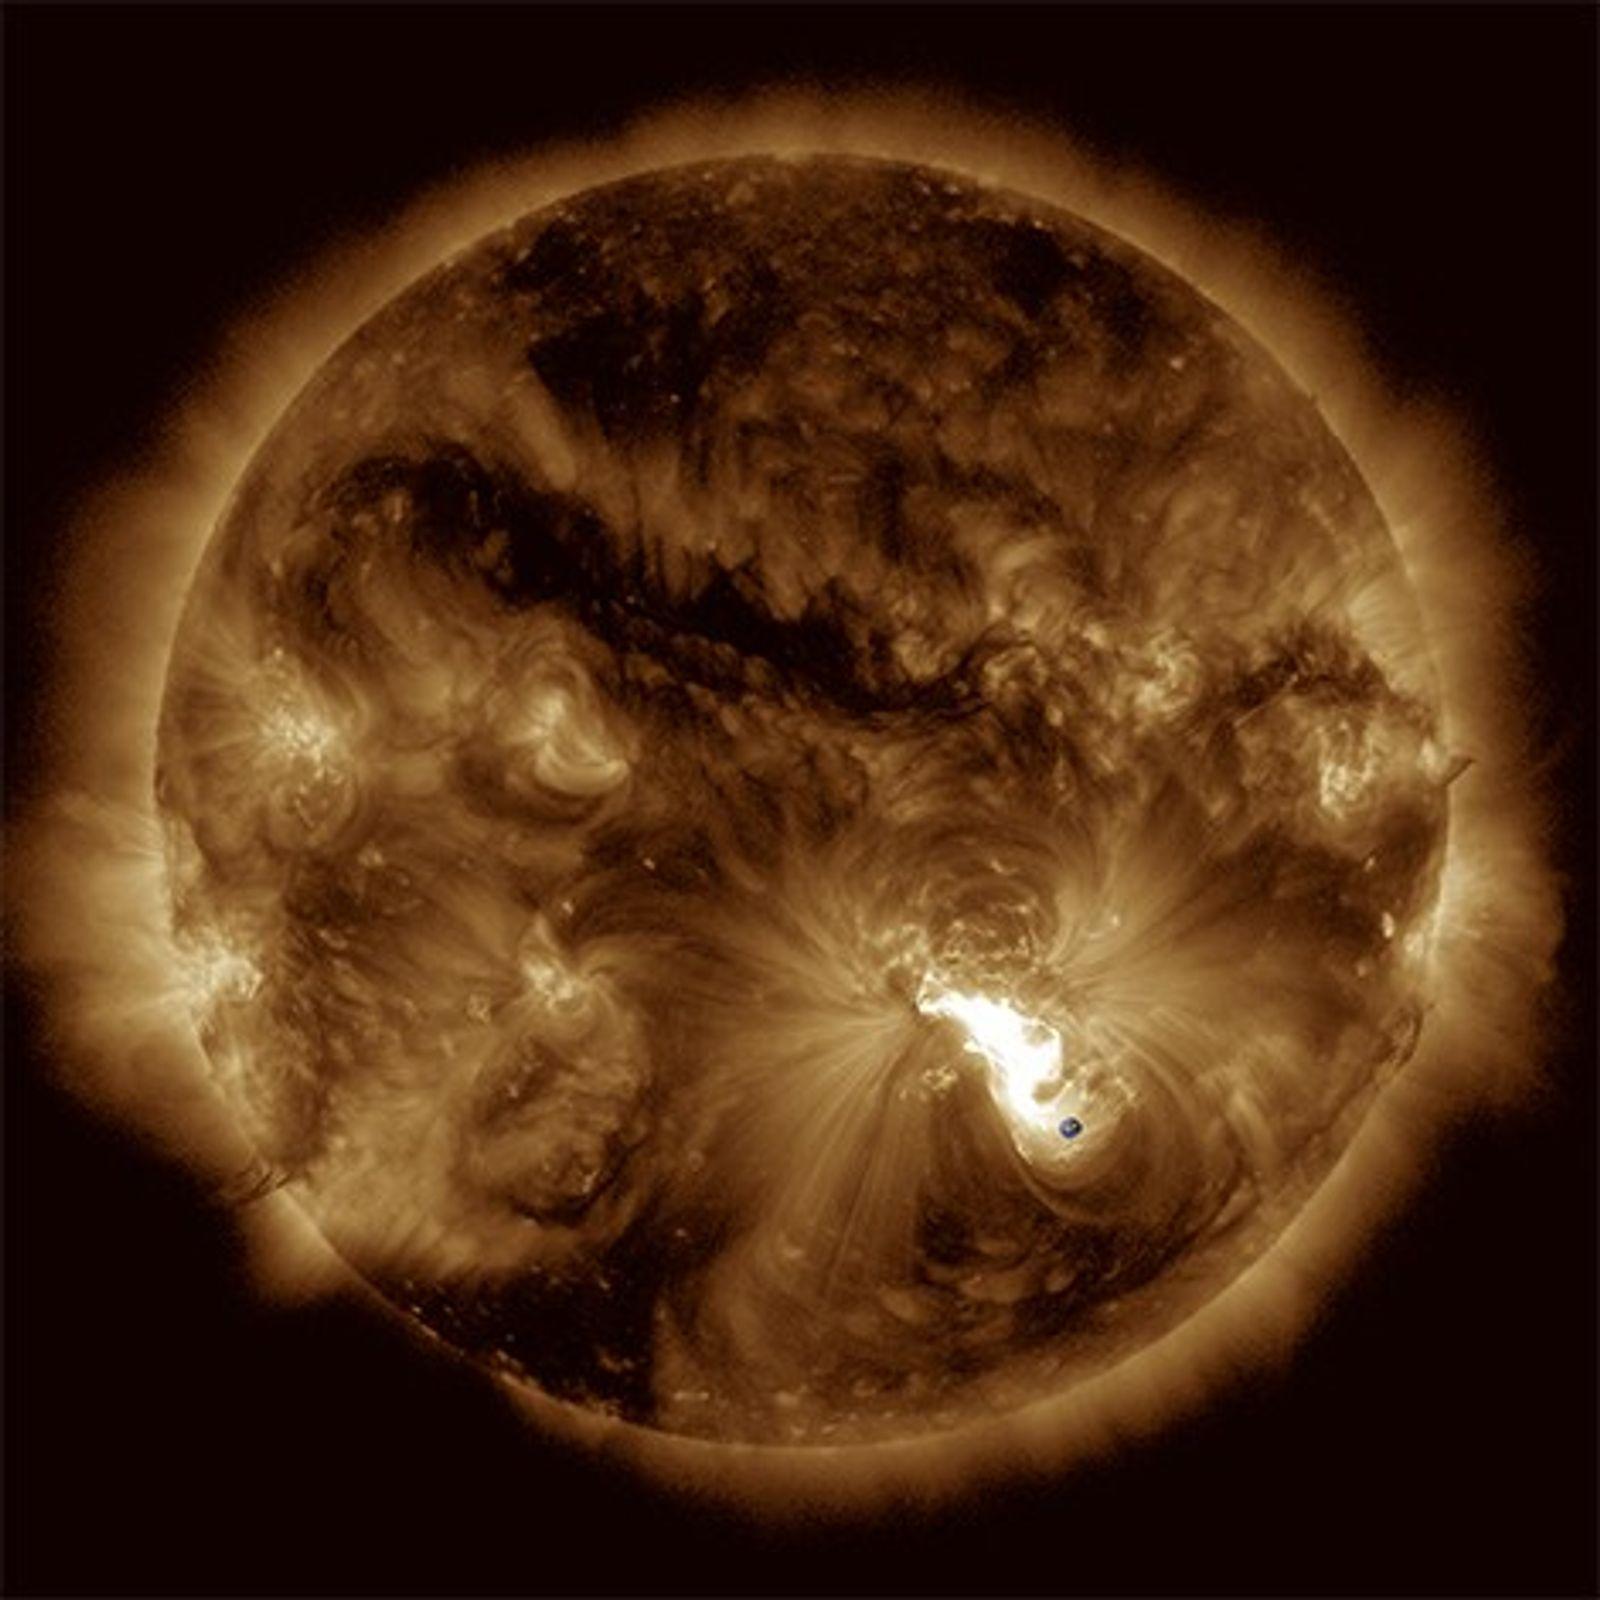 Éruption majeure du 24 octobre 2014 observée par l'instrument AIA de la mission Solar Dynamics Observatory ...